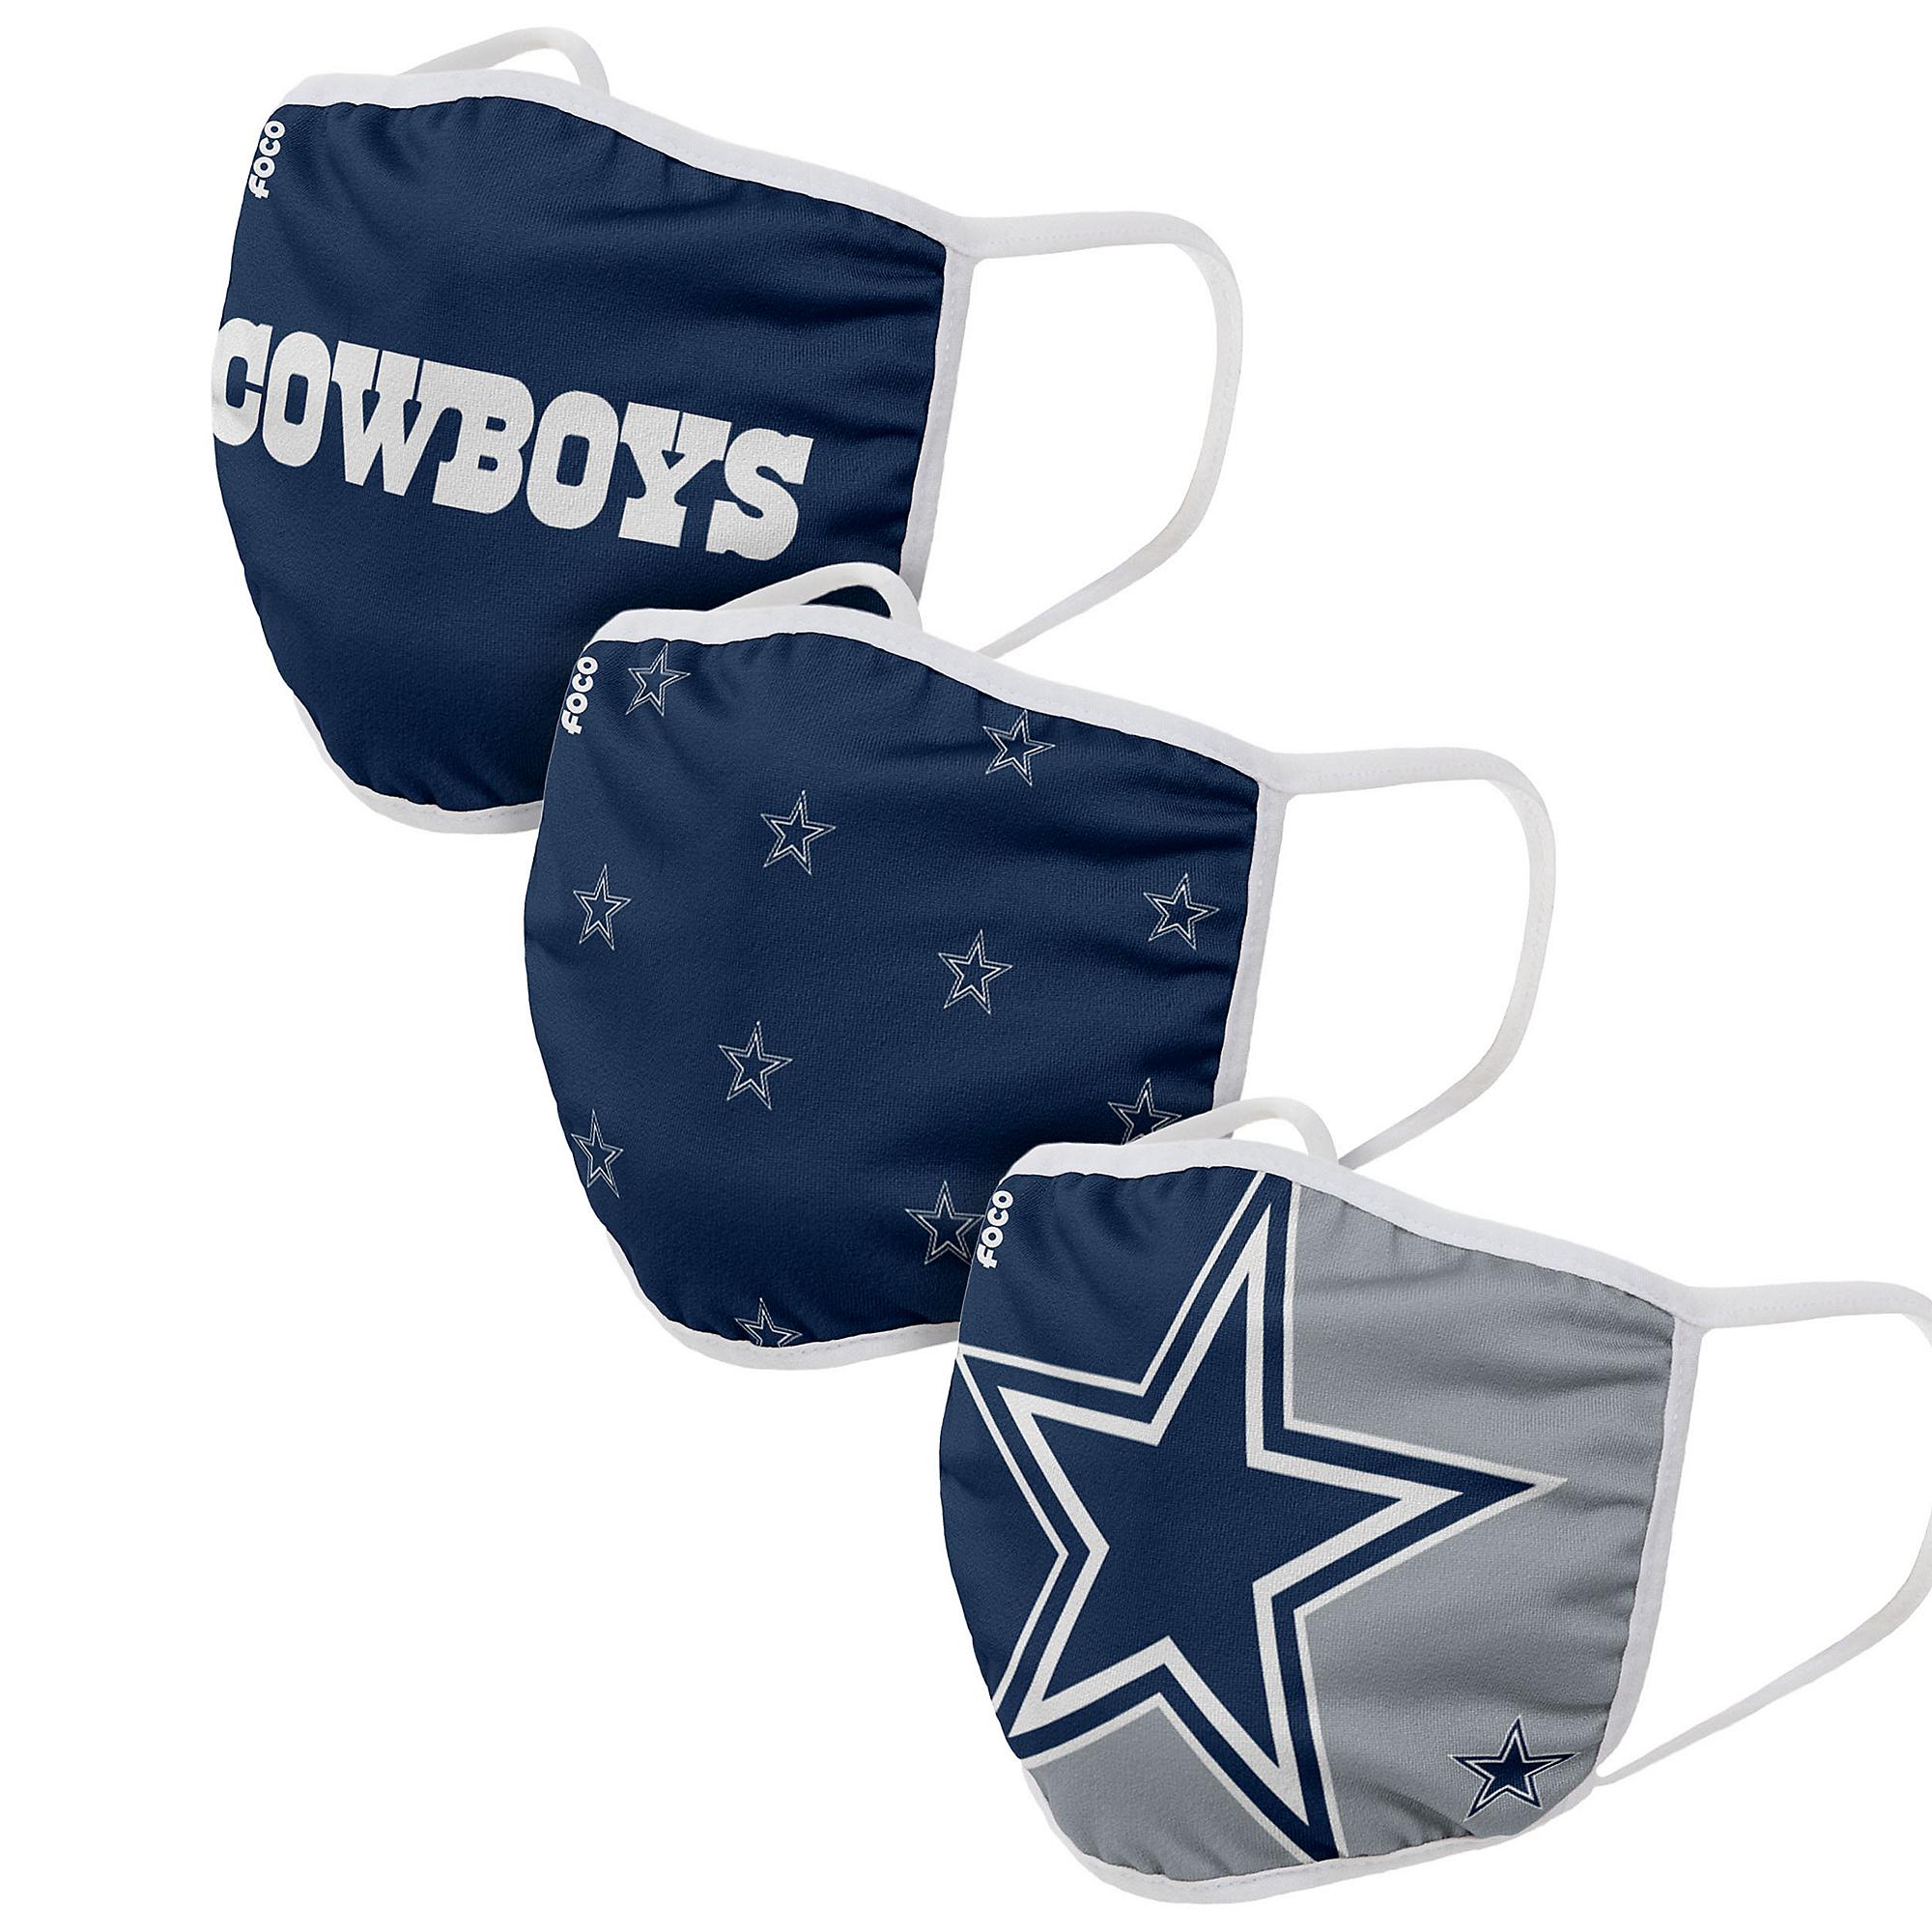 Dallas Cowboys Printed Face Coverings Set of 3